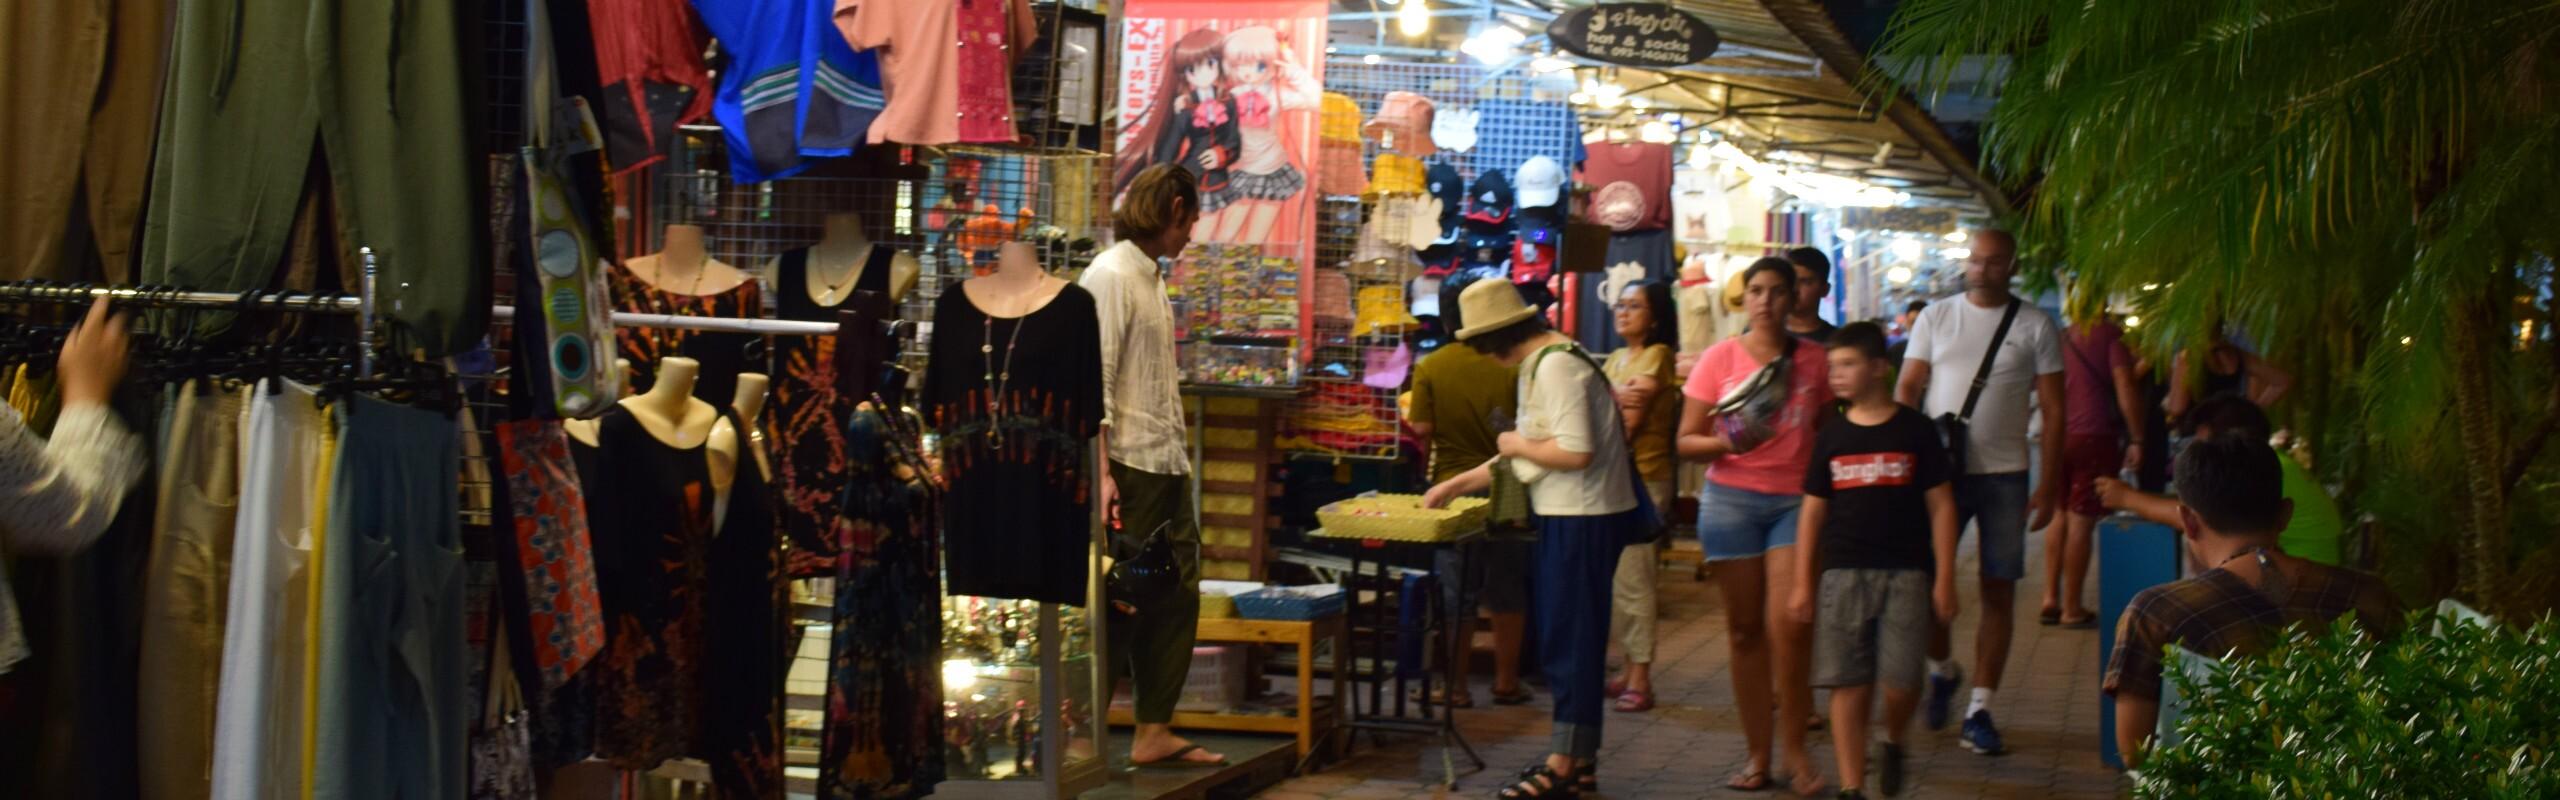 Nightlife in Chiang Rai